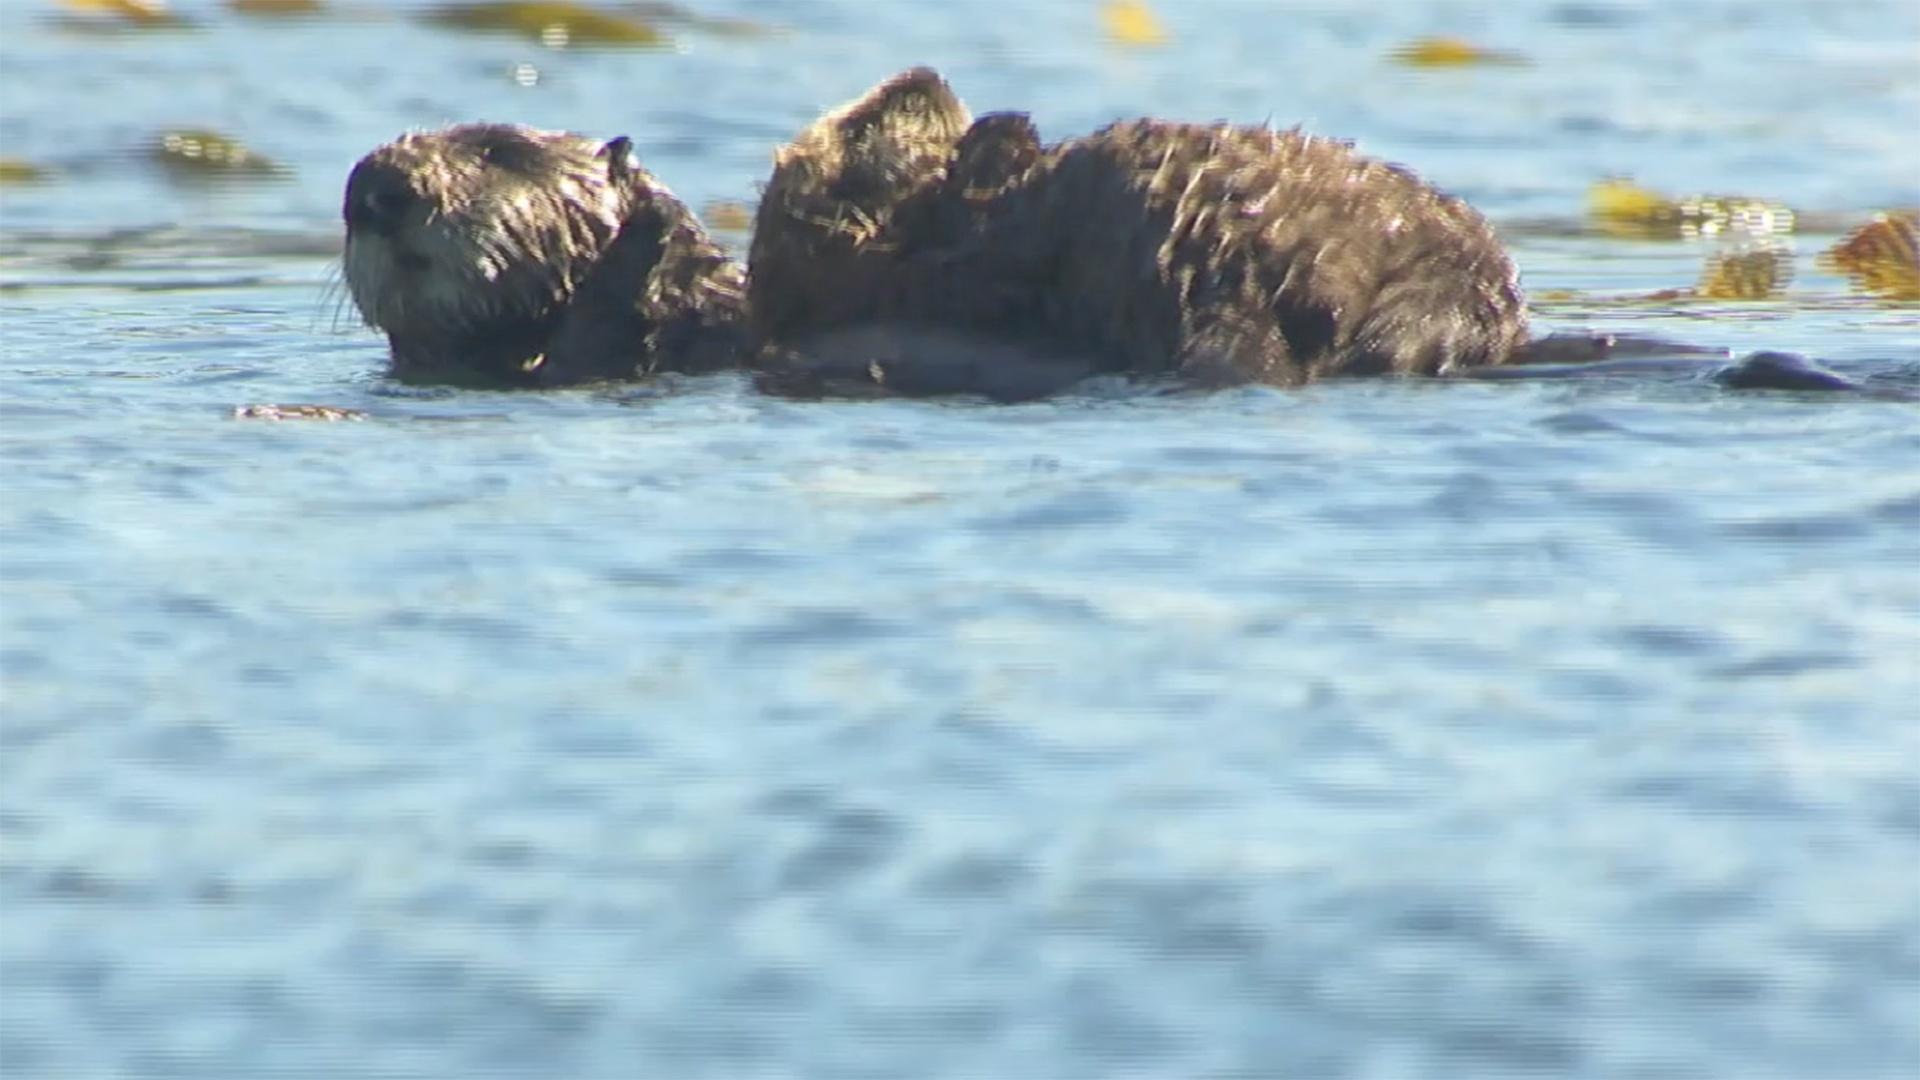 Bixby the Sea Otter